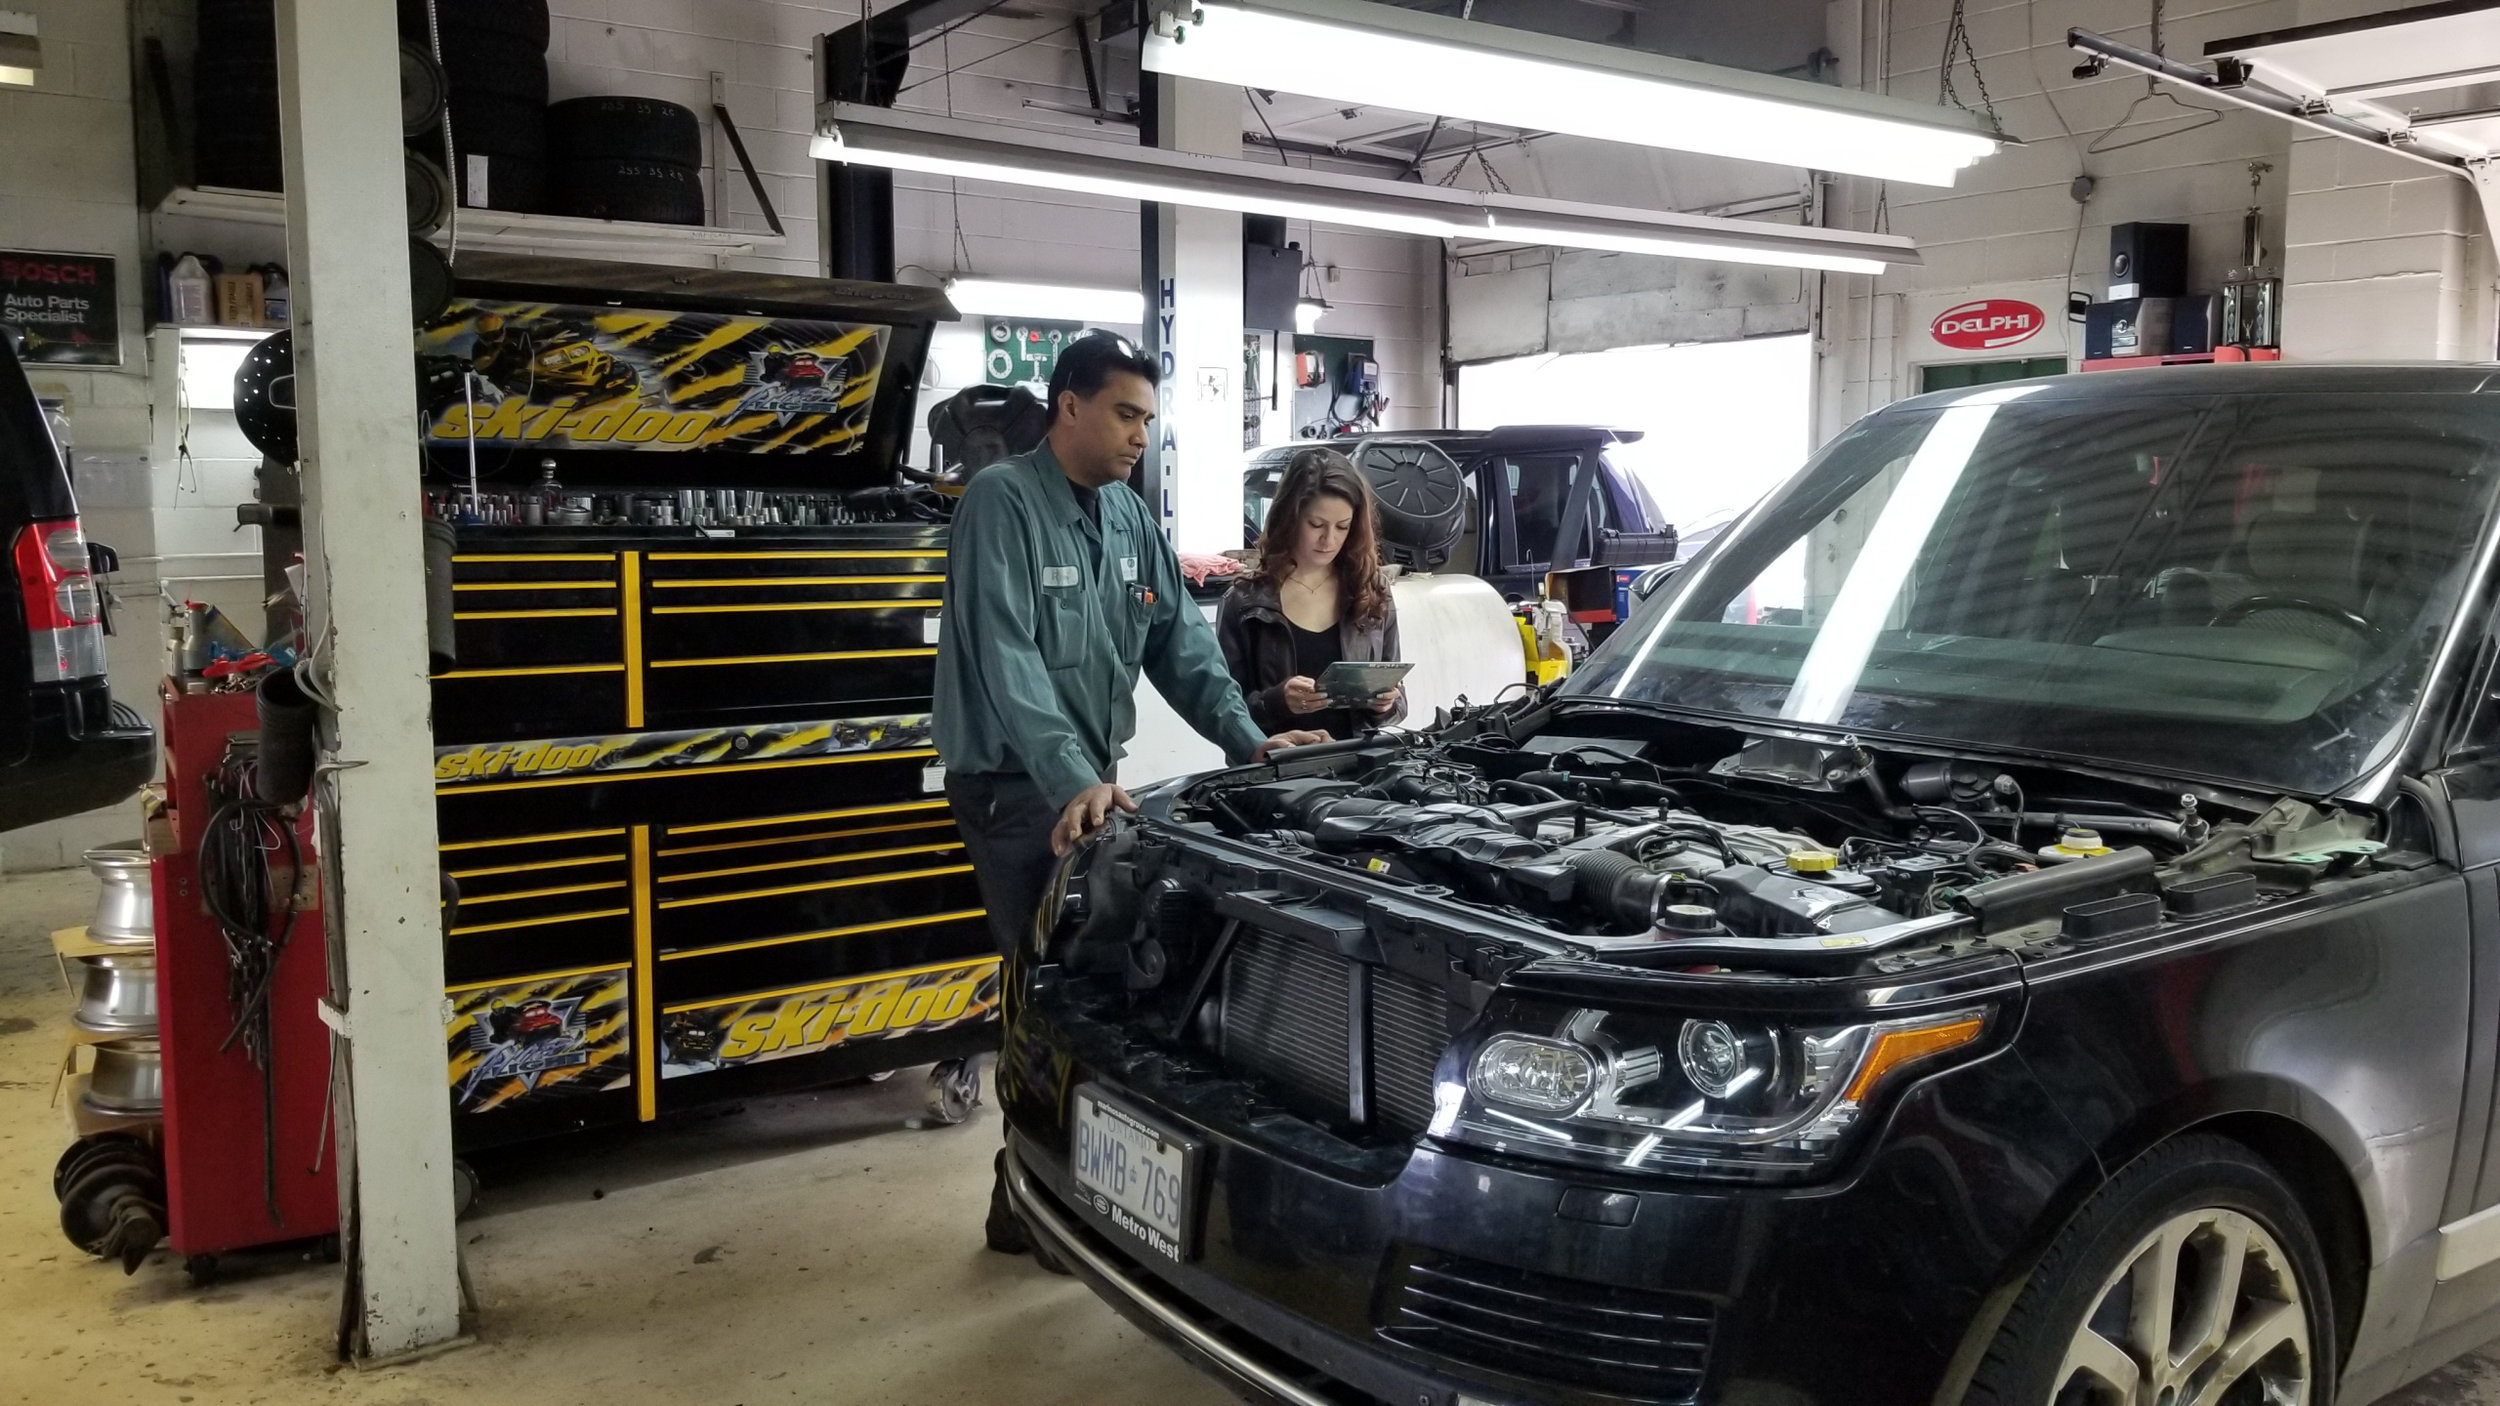 Birkshire Range Rover may 2019-41.jpg